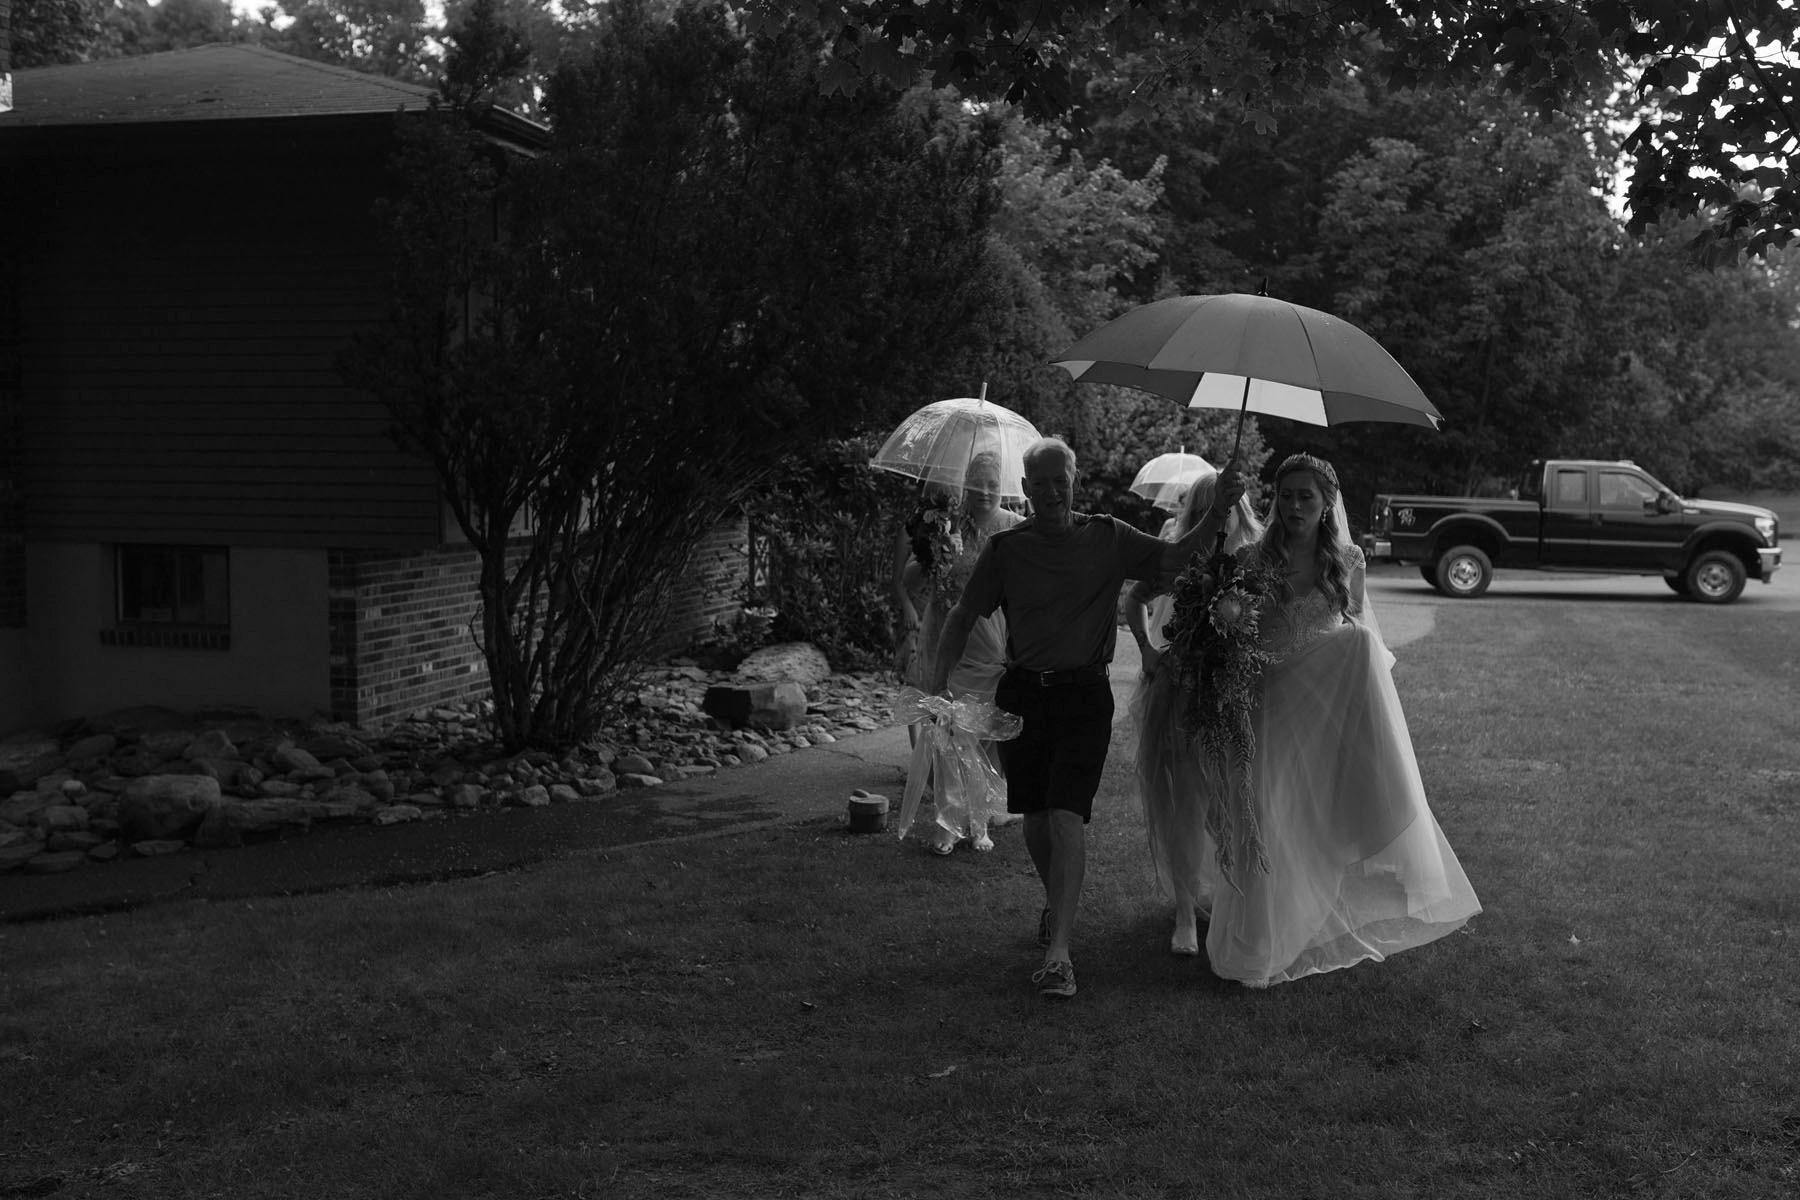 Bucks_County_wedding_photographer_Stroudsmoor_country_inn_wedding_Philadelphia_wedding_photographer_08_rainy_wedding_photo.JPG